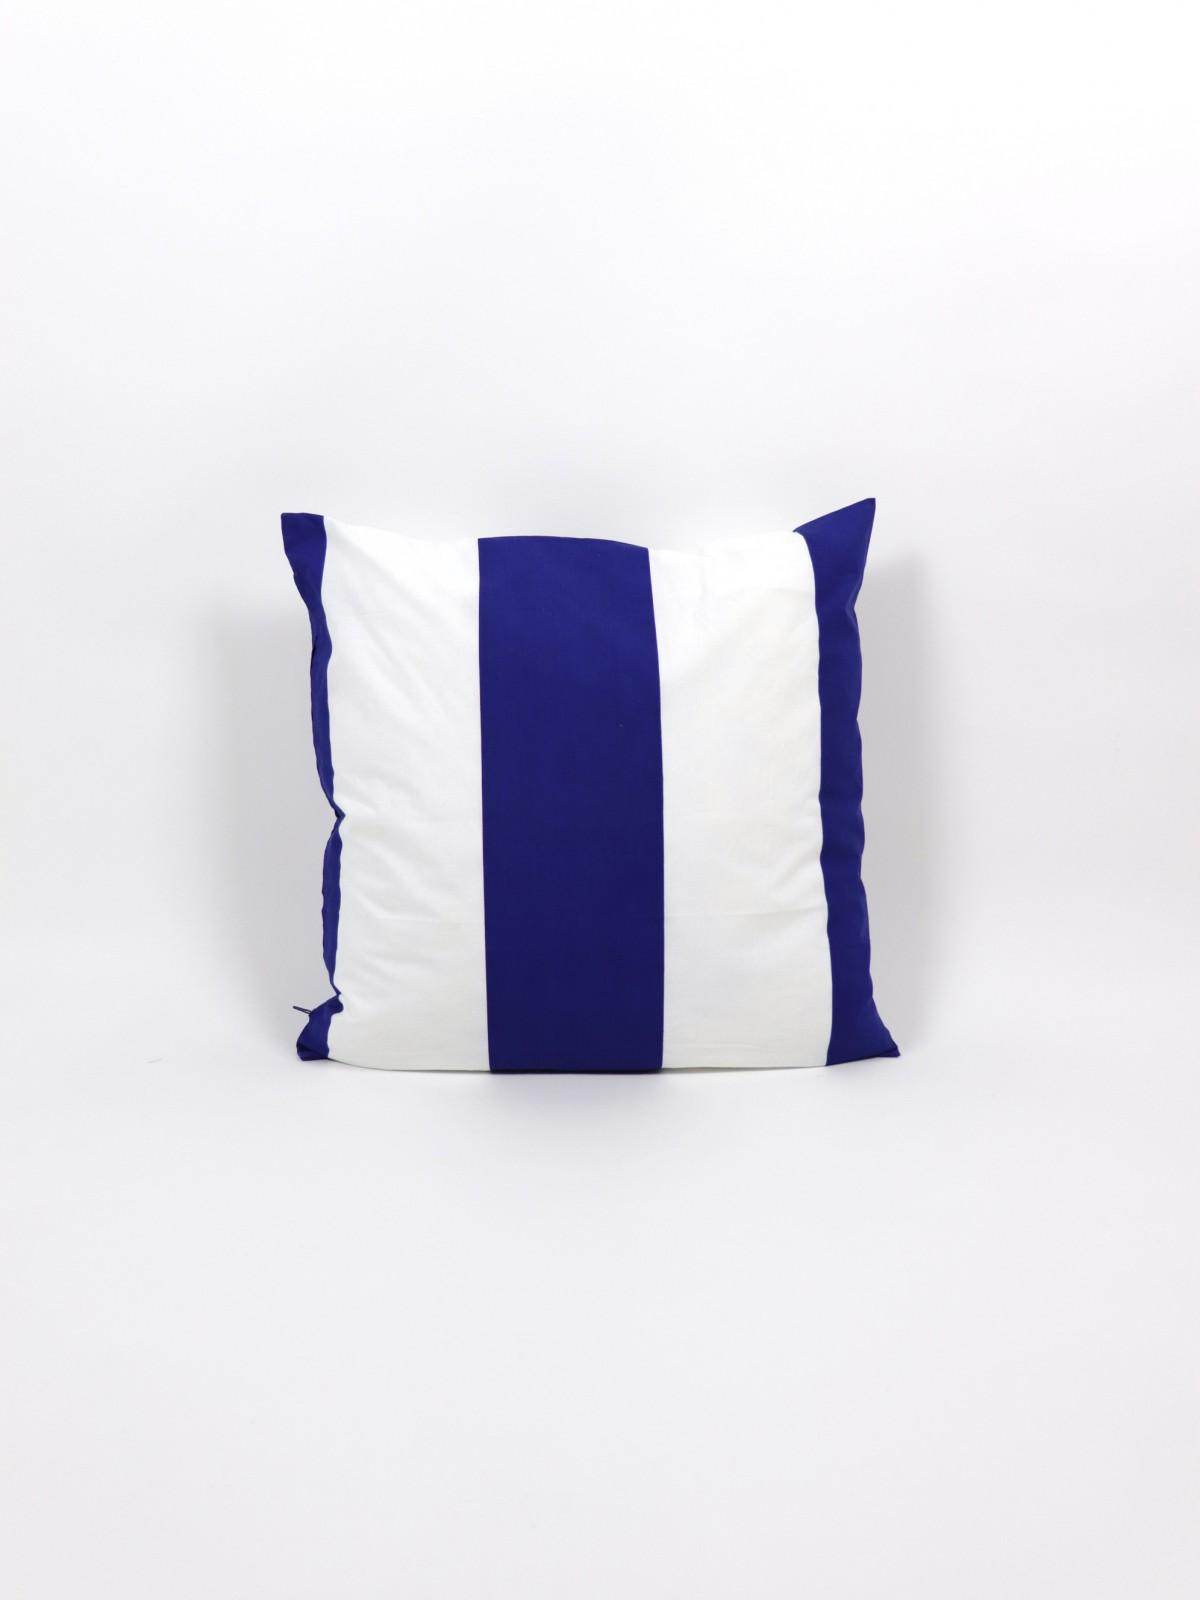 Ralph lauren, deadstock cotton, USA, BROWN.remake, cushion